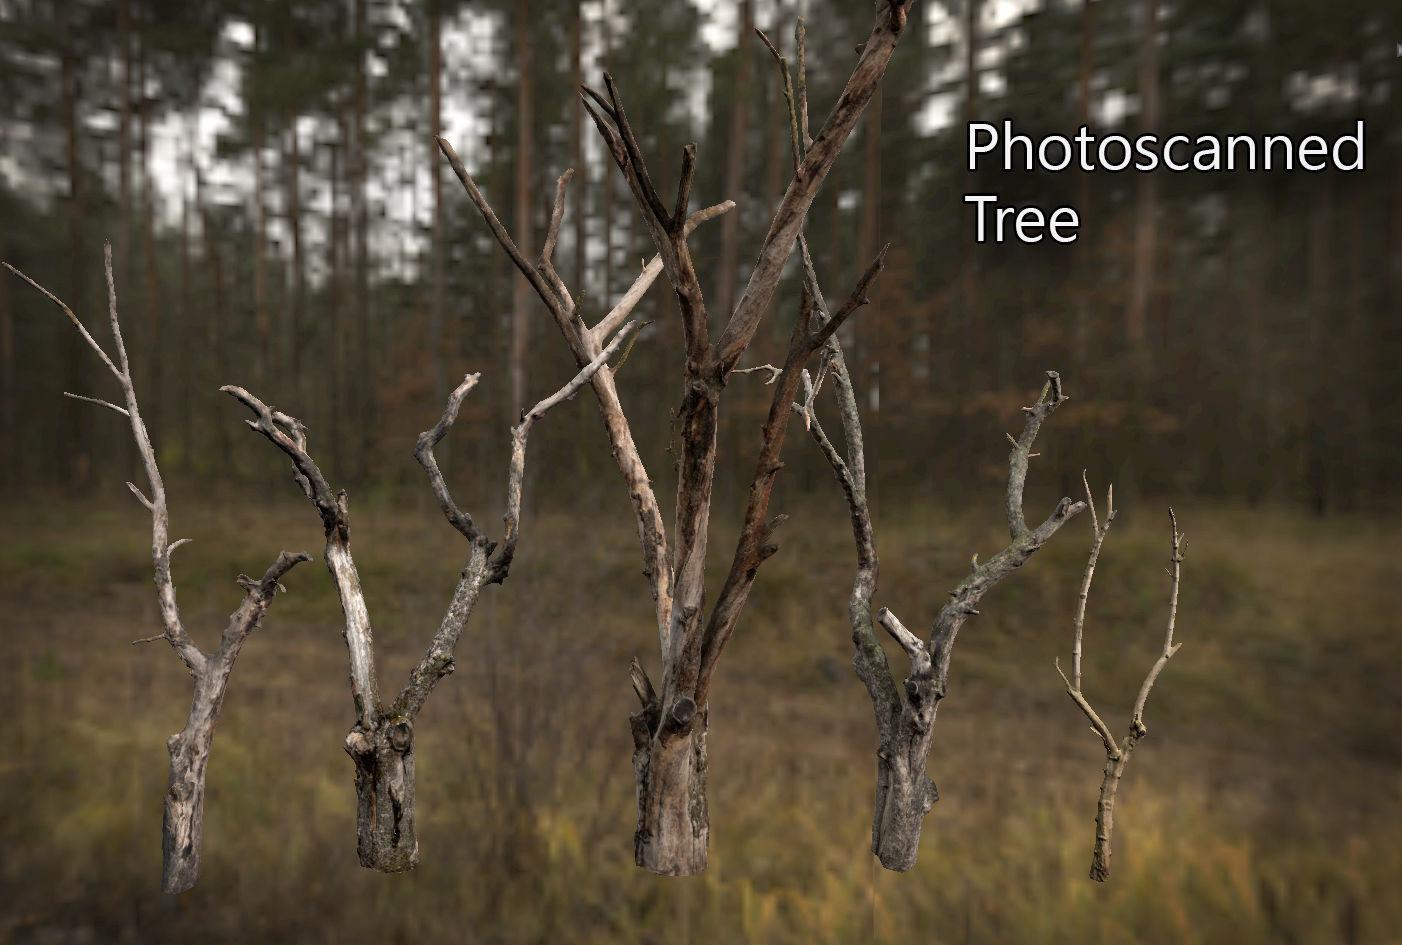 Photorealistic Photoscanned Tree | 3D model